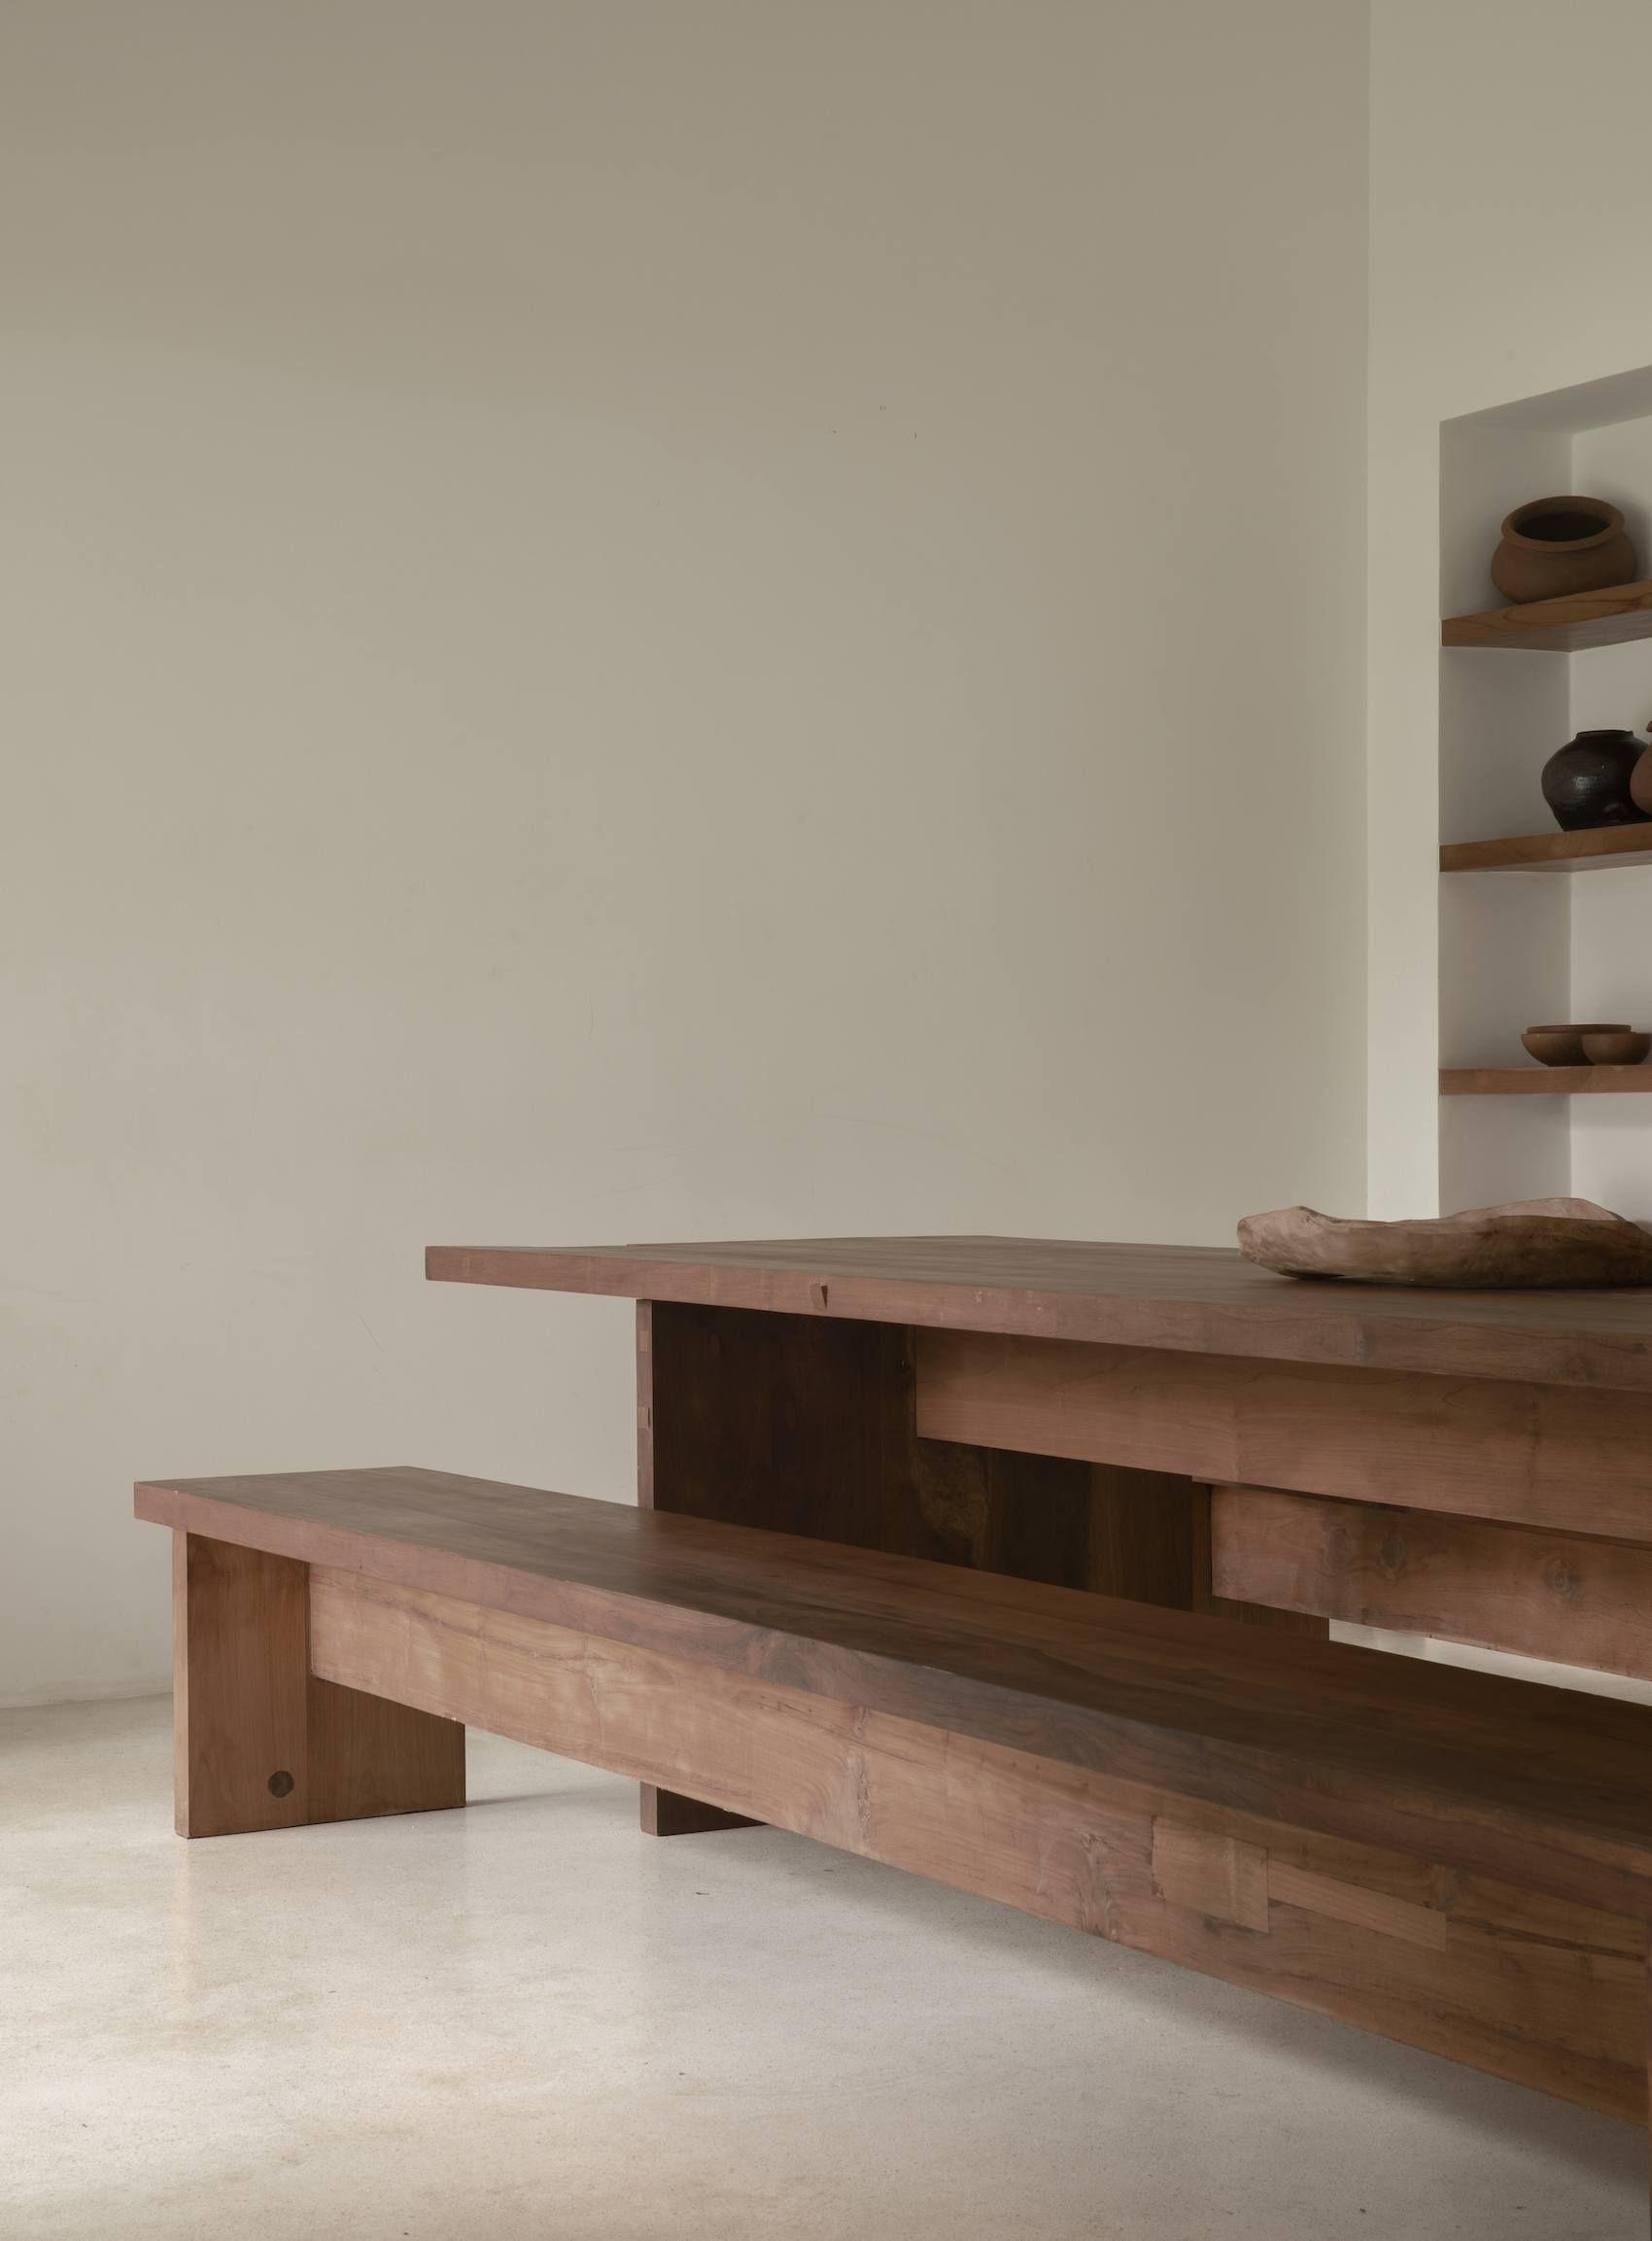 2019 Ignant Norm Architects Interior Design Minimalism Inte